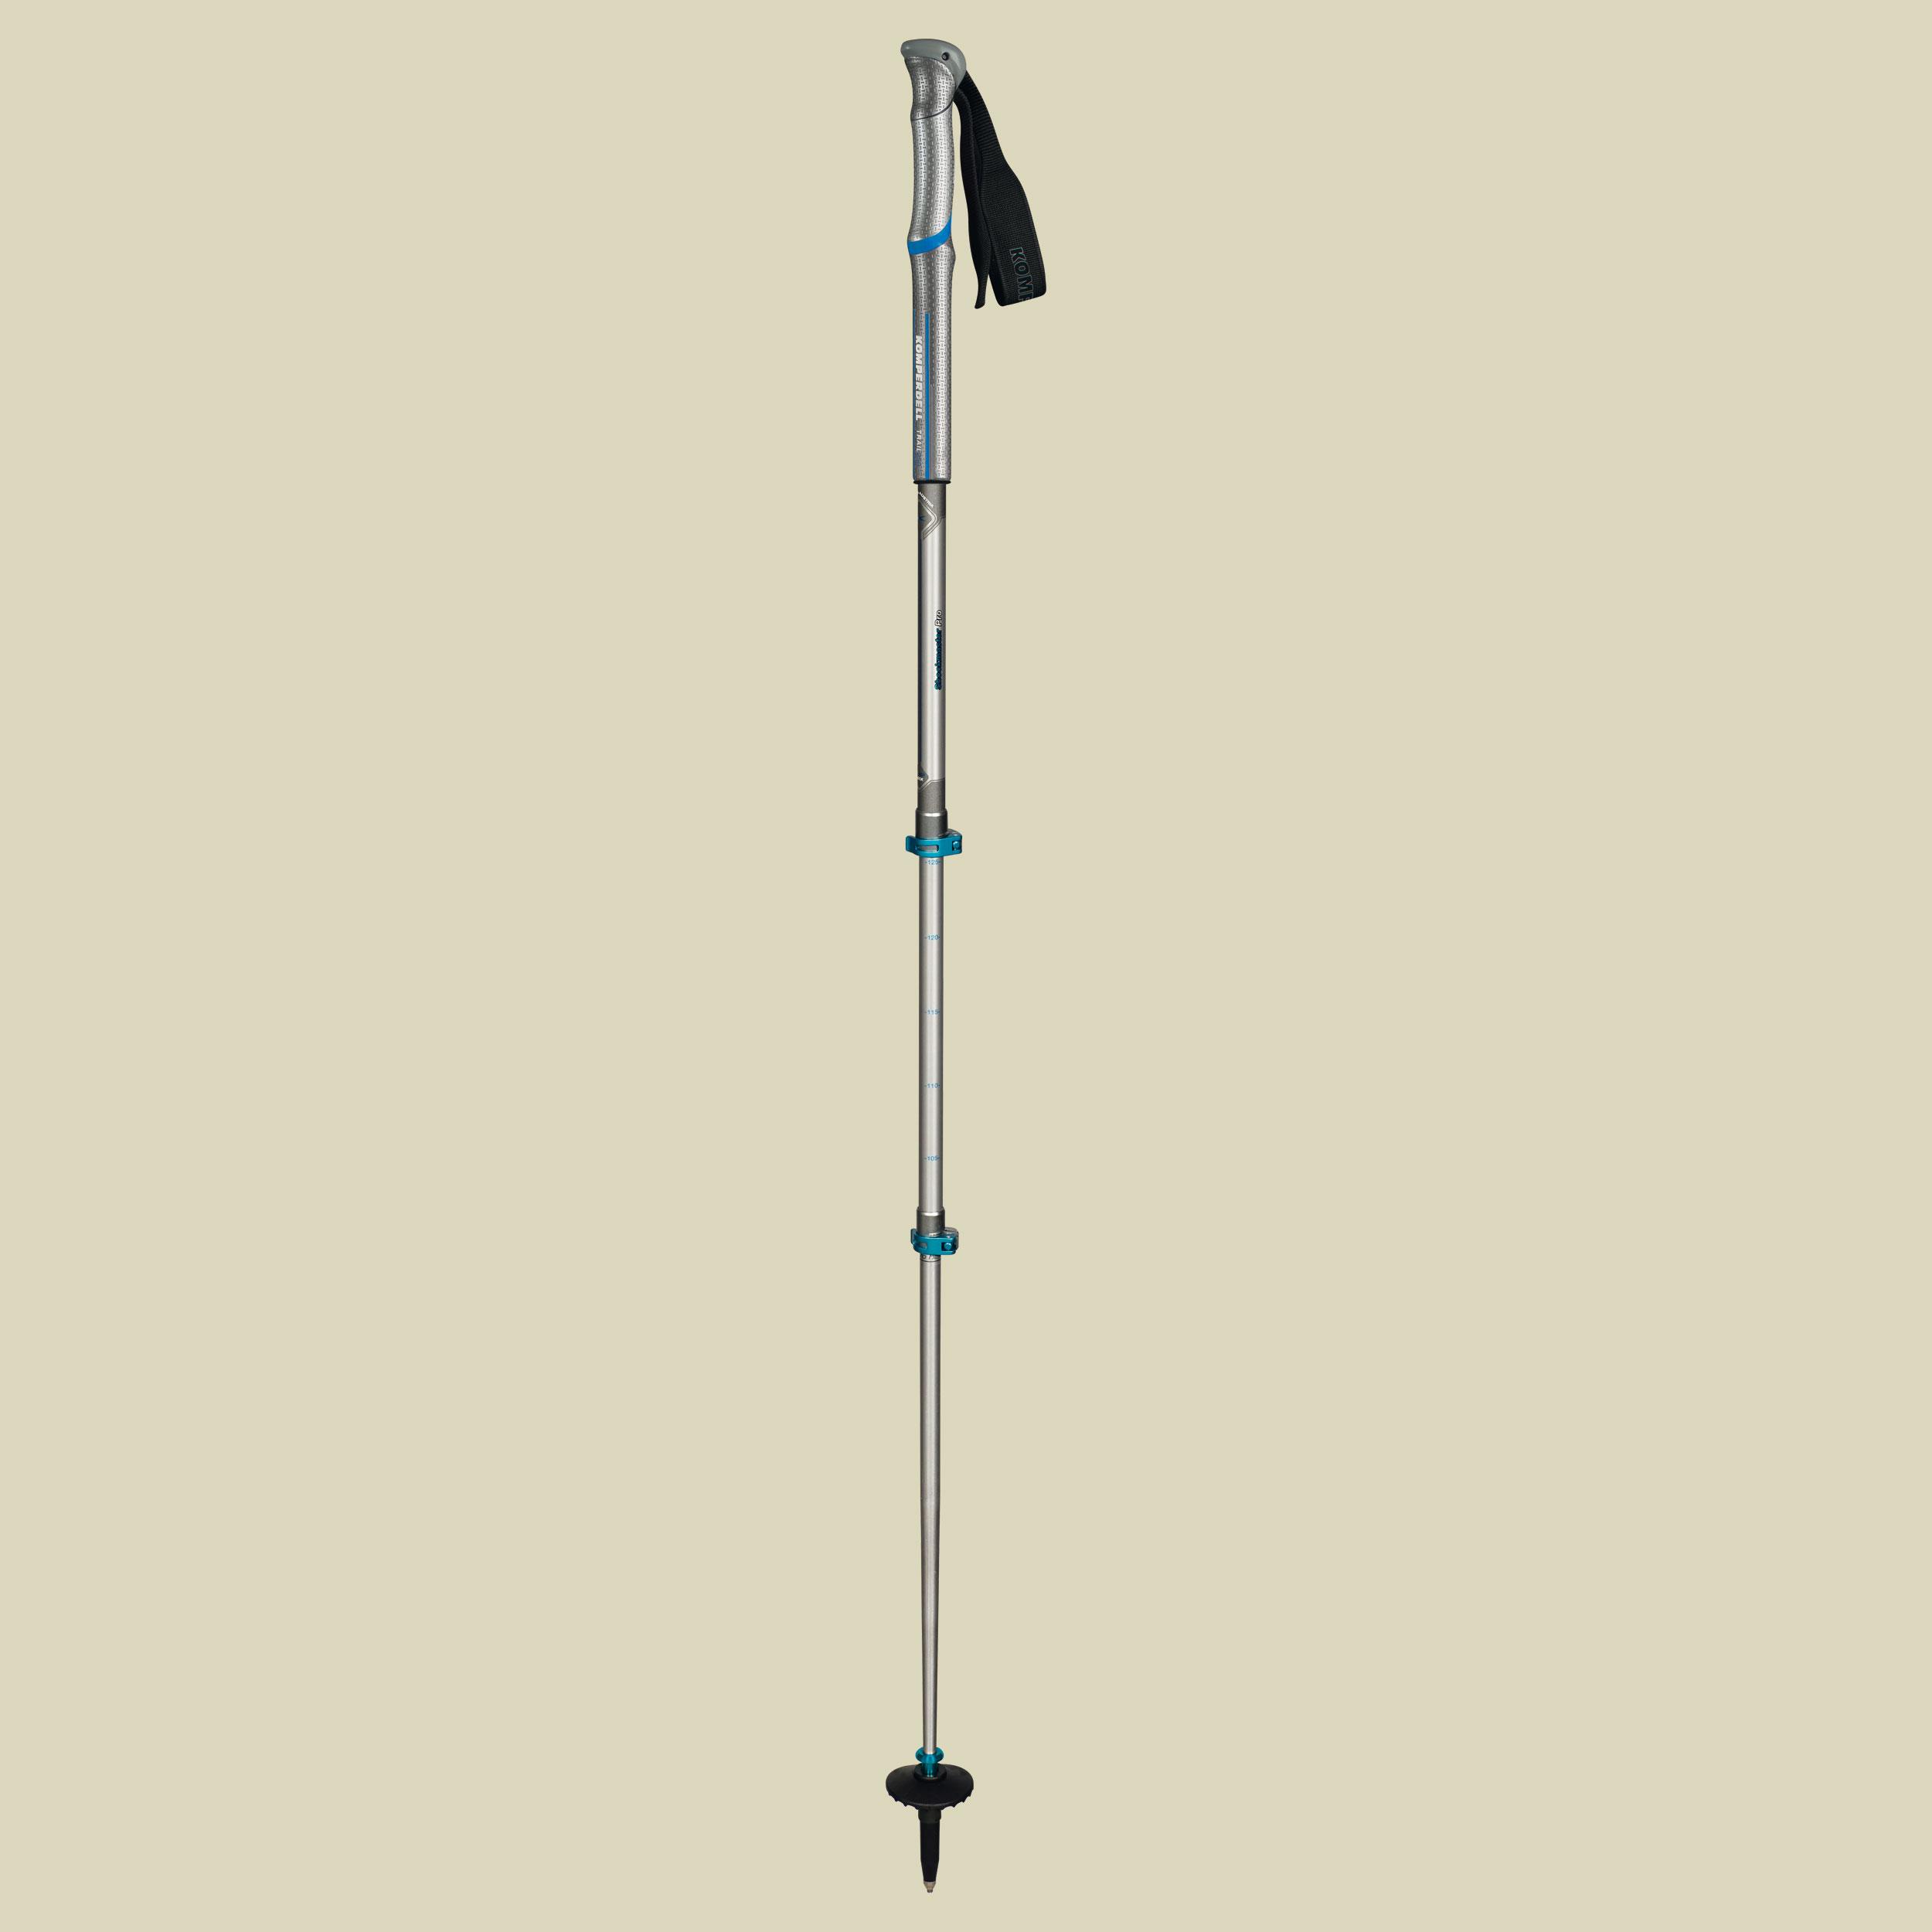 Komperdell, Shockmaster Pro Powerlock, Trekking Touren Stock, Farbe: silver/blue